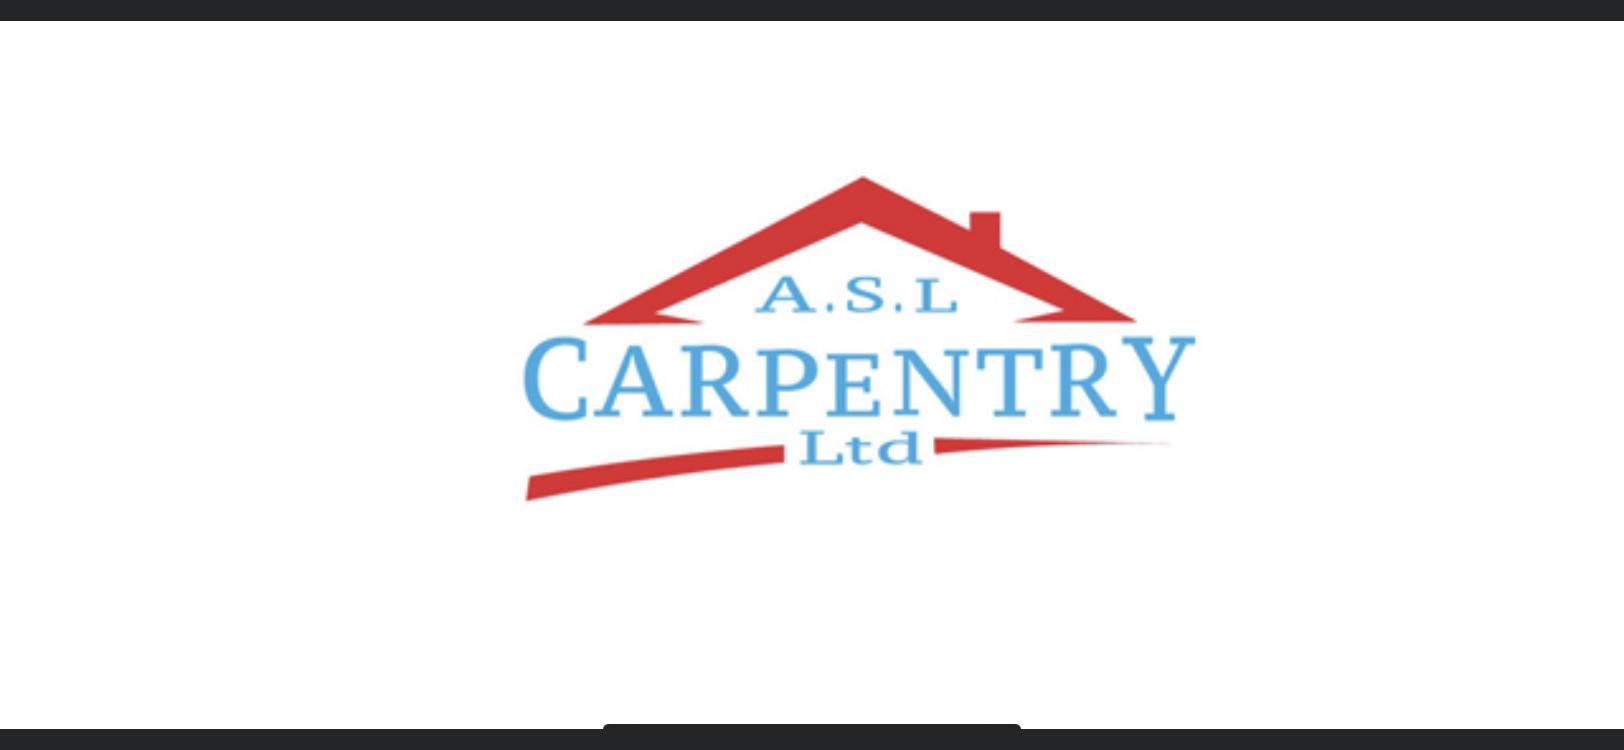 A.S.L Carpentry & Construction Ltd Verified Logo